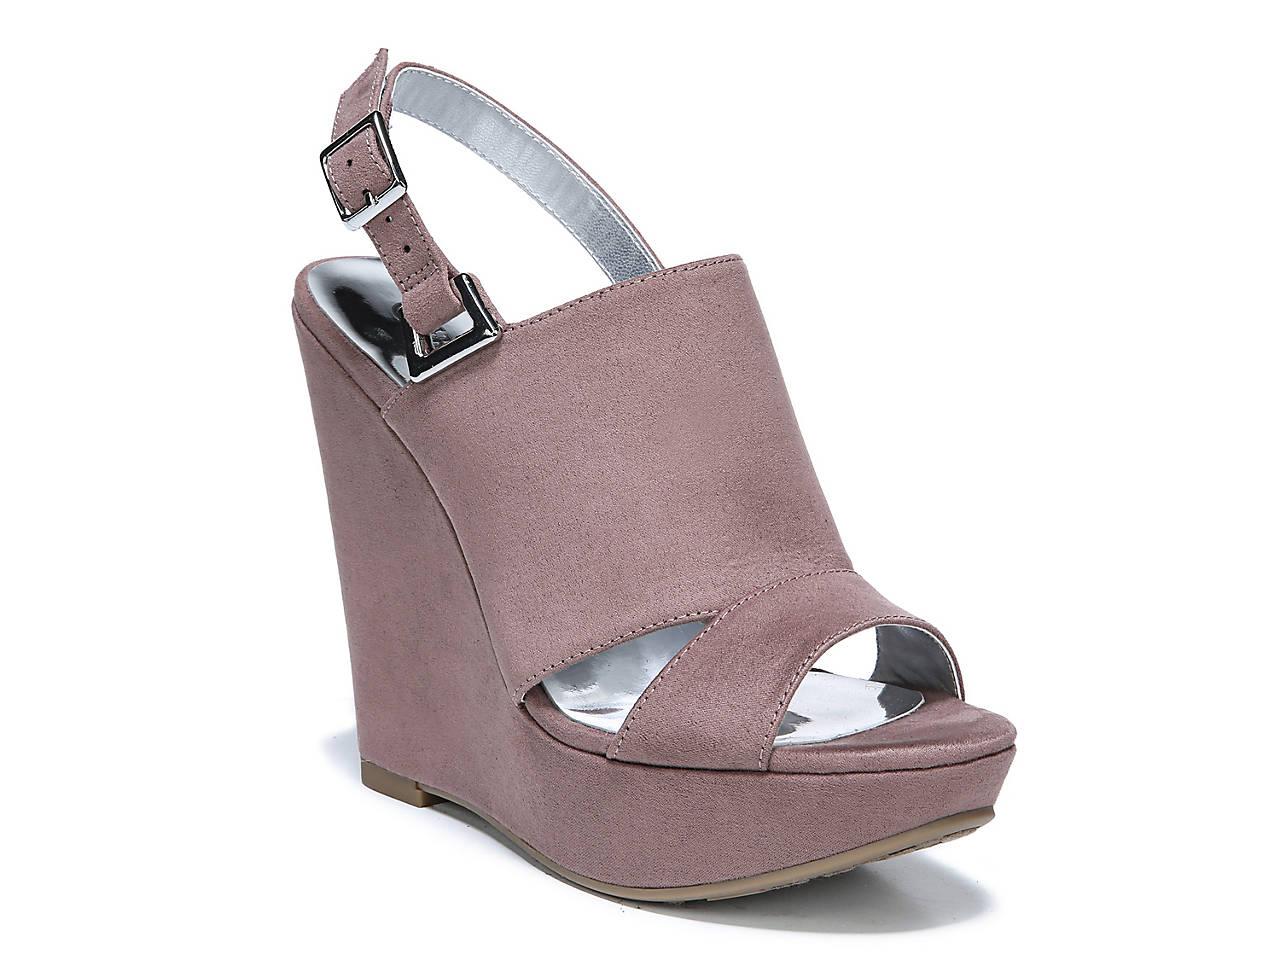 565505007480 Carlos by Carlos Santana Becca Wedge Sandal Women s Shoes